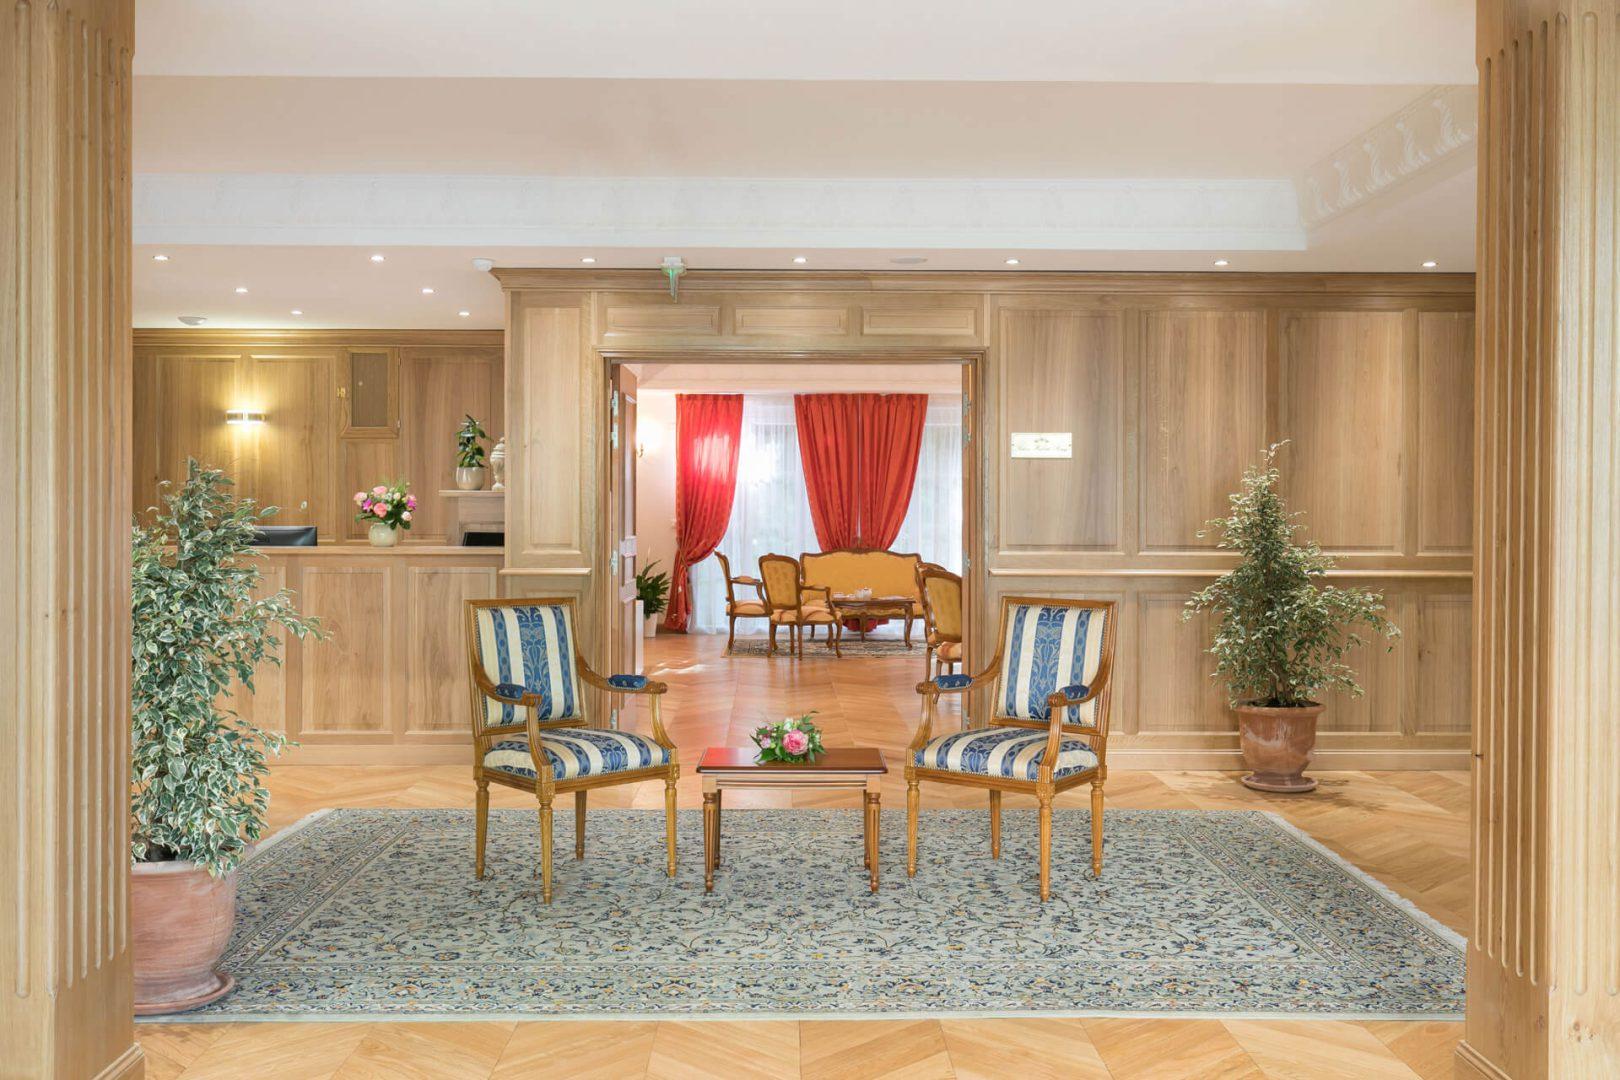 Résidence senior Dijon Villa Médicis - Intérieur de la Villa